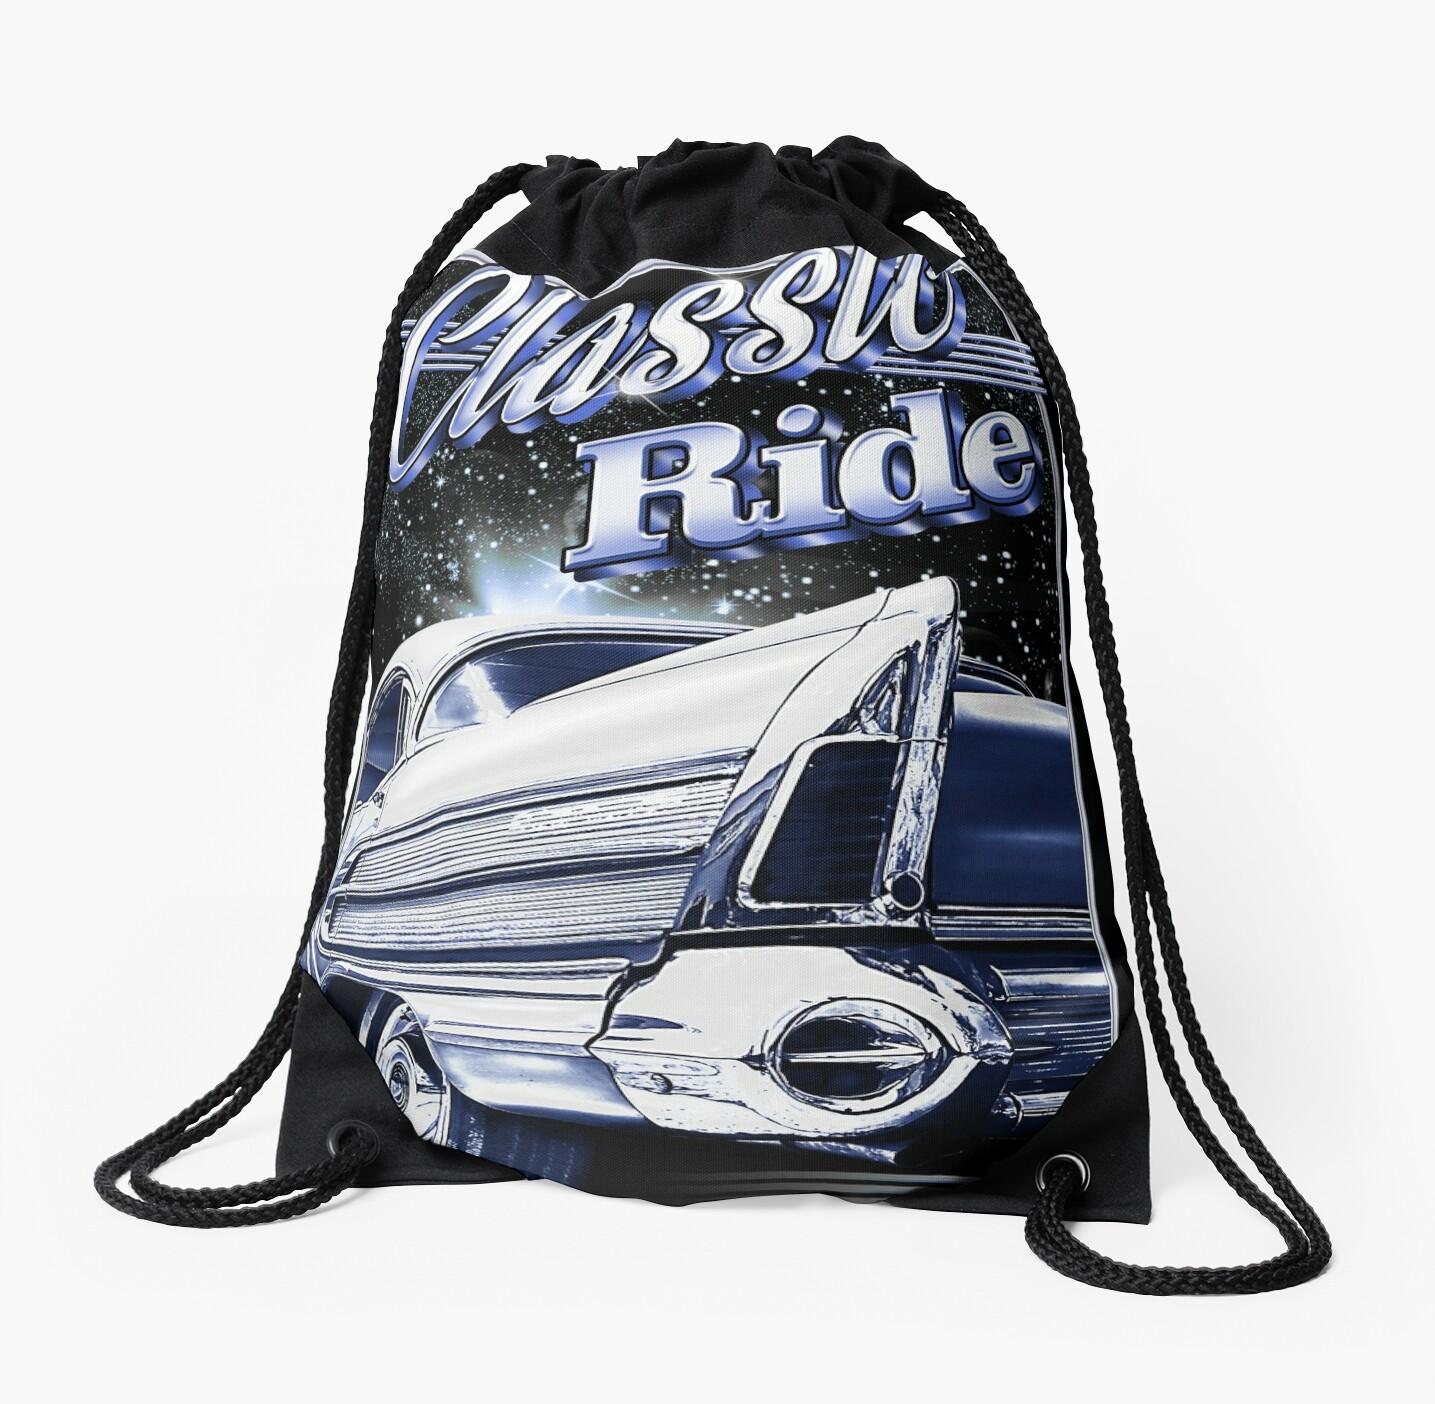 Classic Ride by LeoZitro